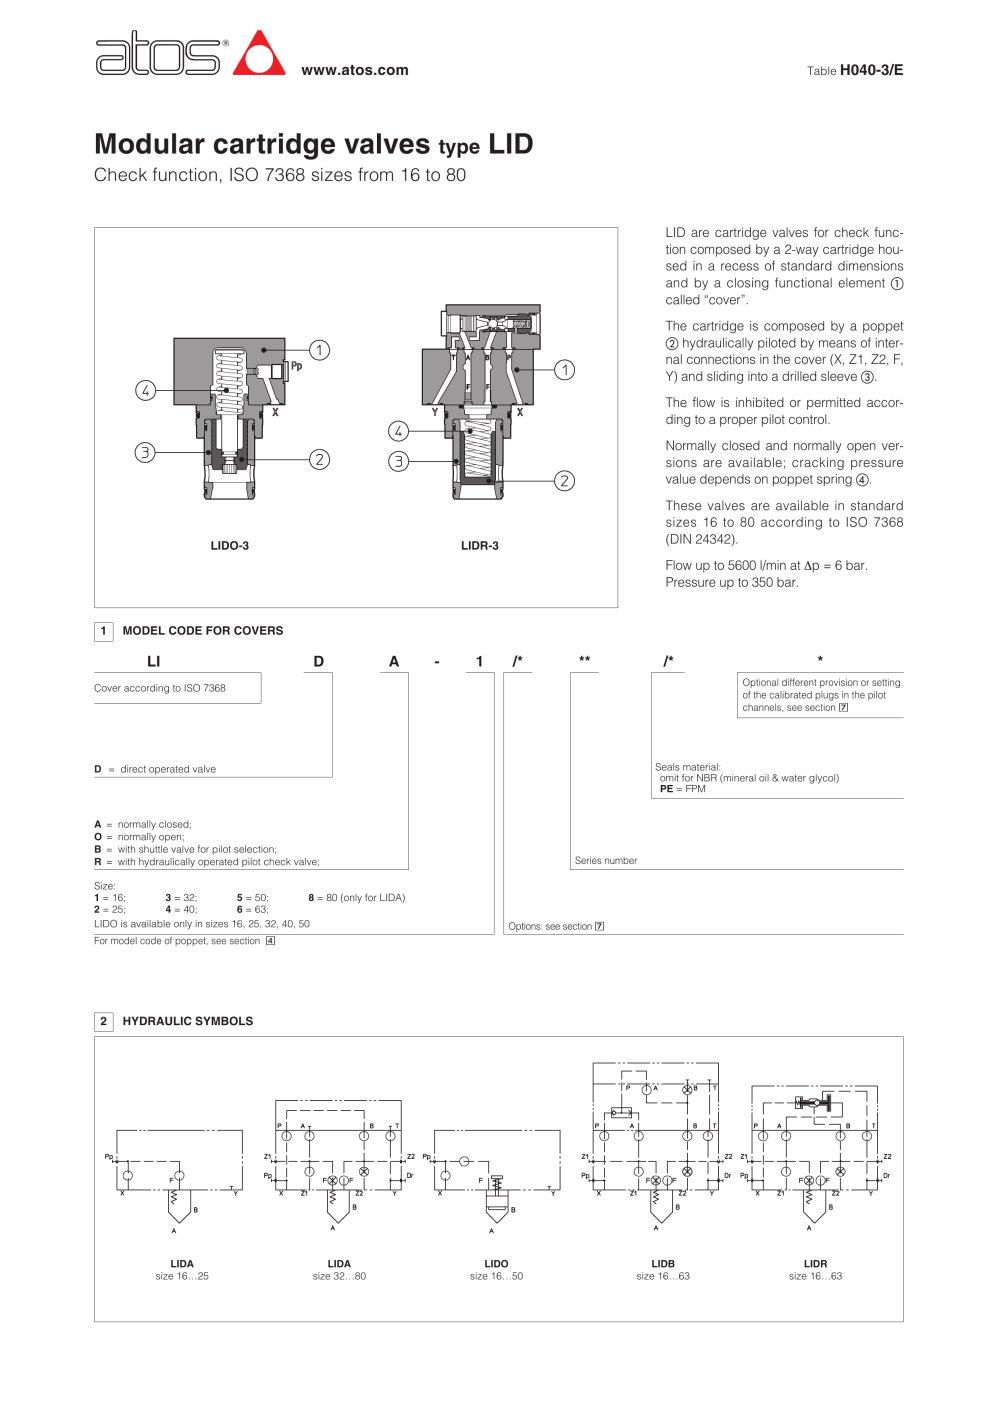 Modular cartridge valves type lid atos pdf catalogue technical modular cartridge valves type lid 1 4 pages biocorpaavc Choice Image